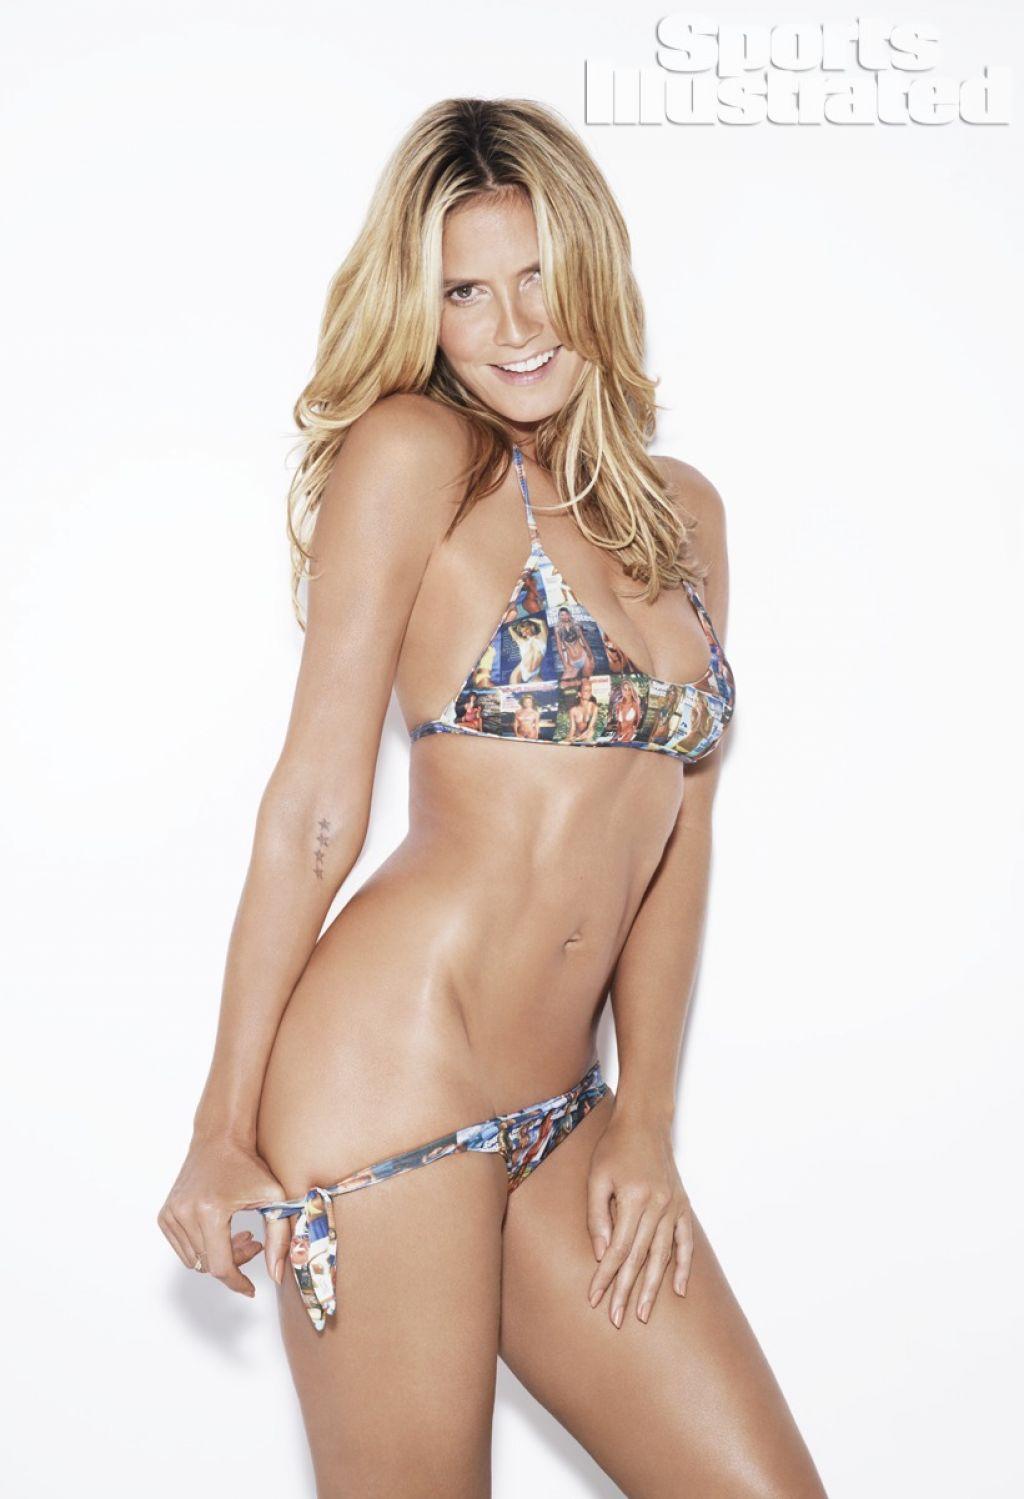 Heidi Klum - Sports Illustrated Swimwear Photoshoot 2014-9535